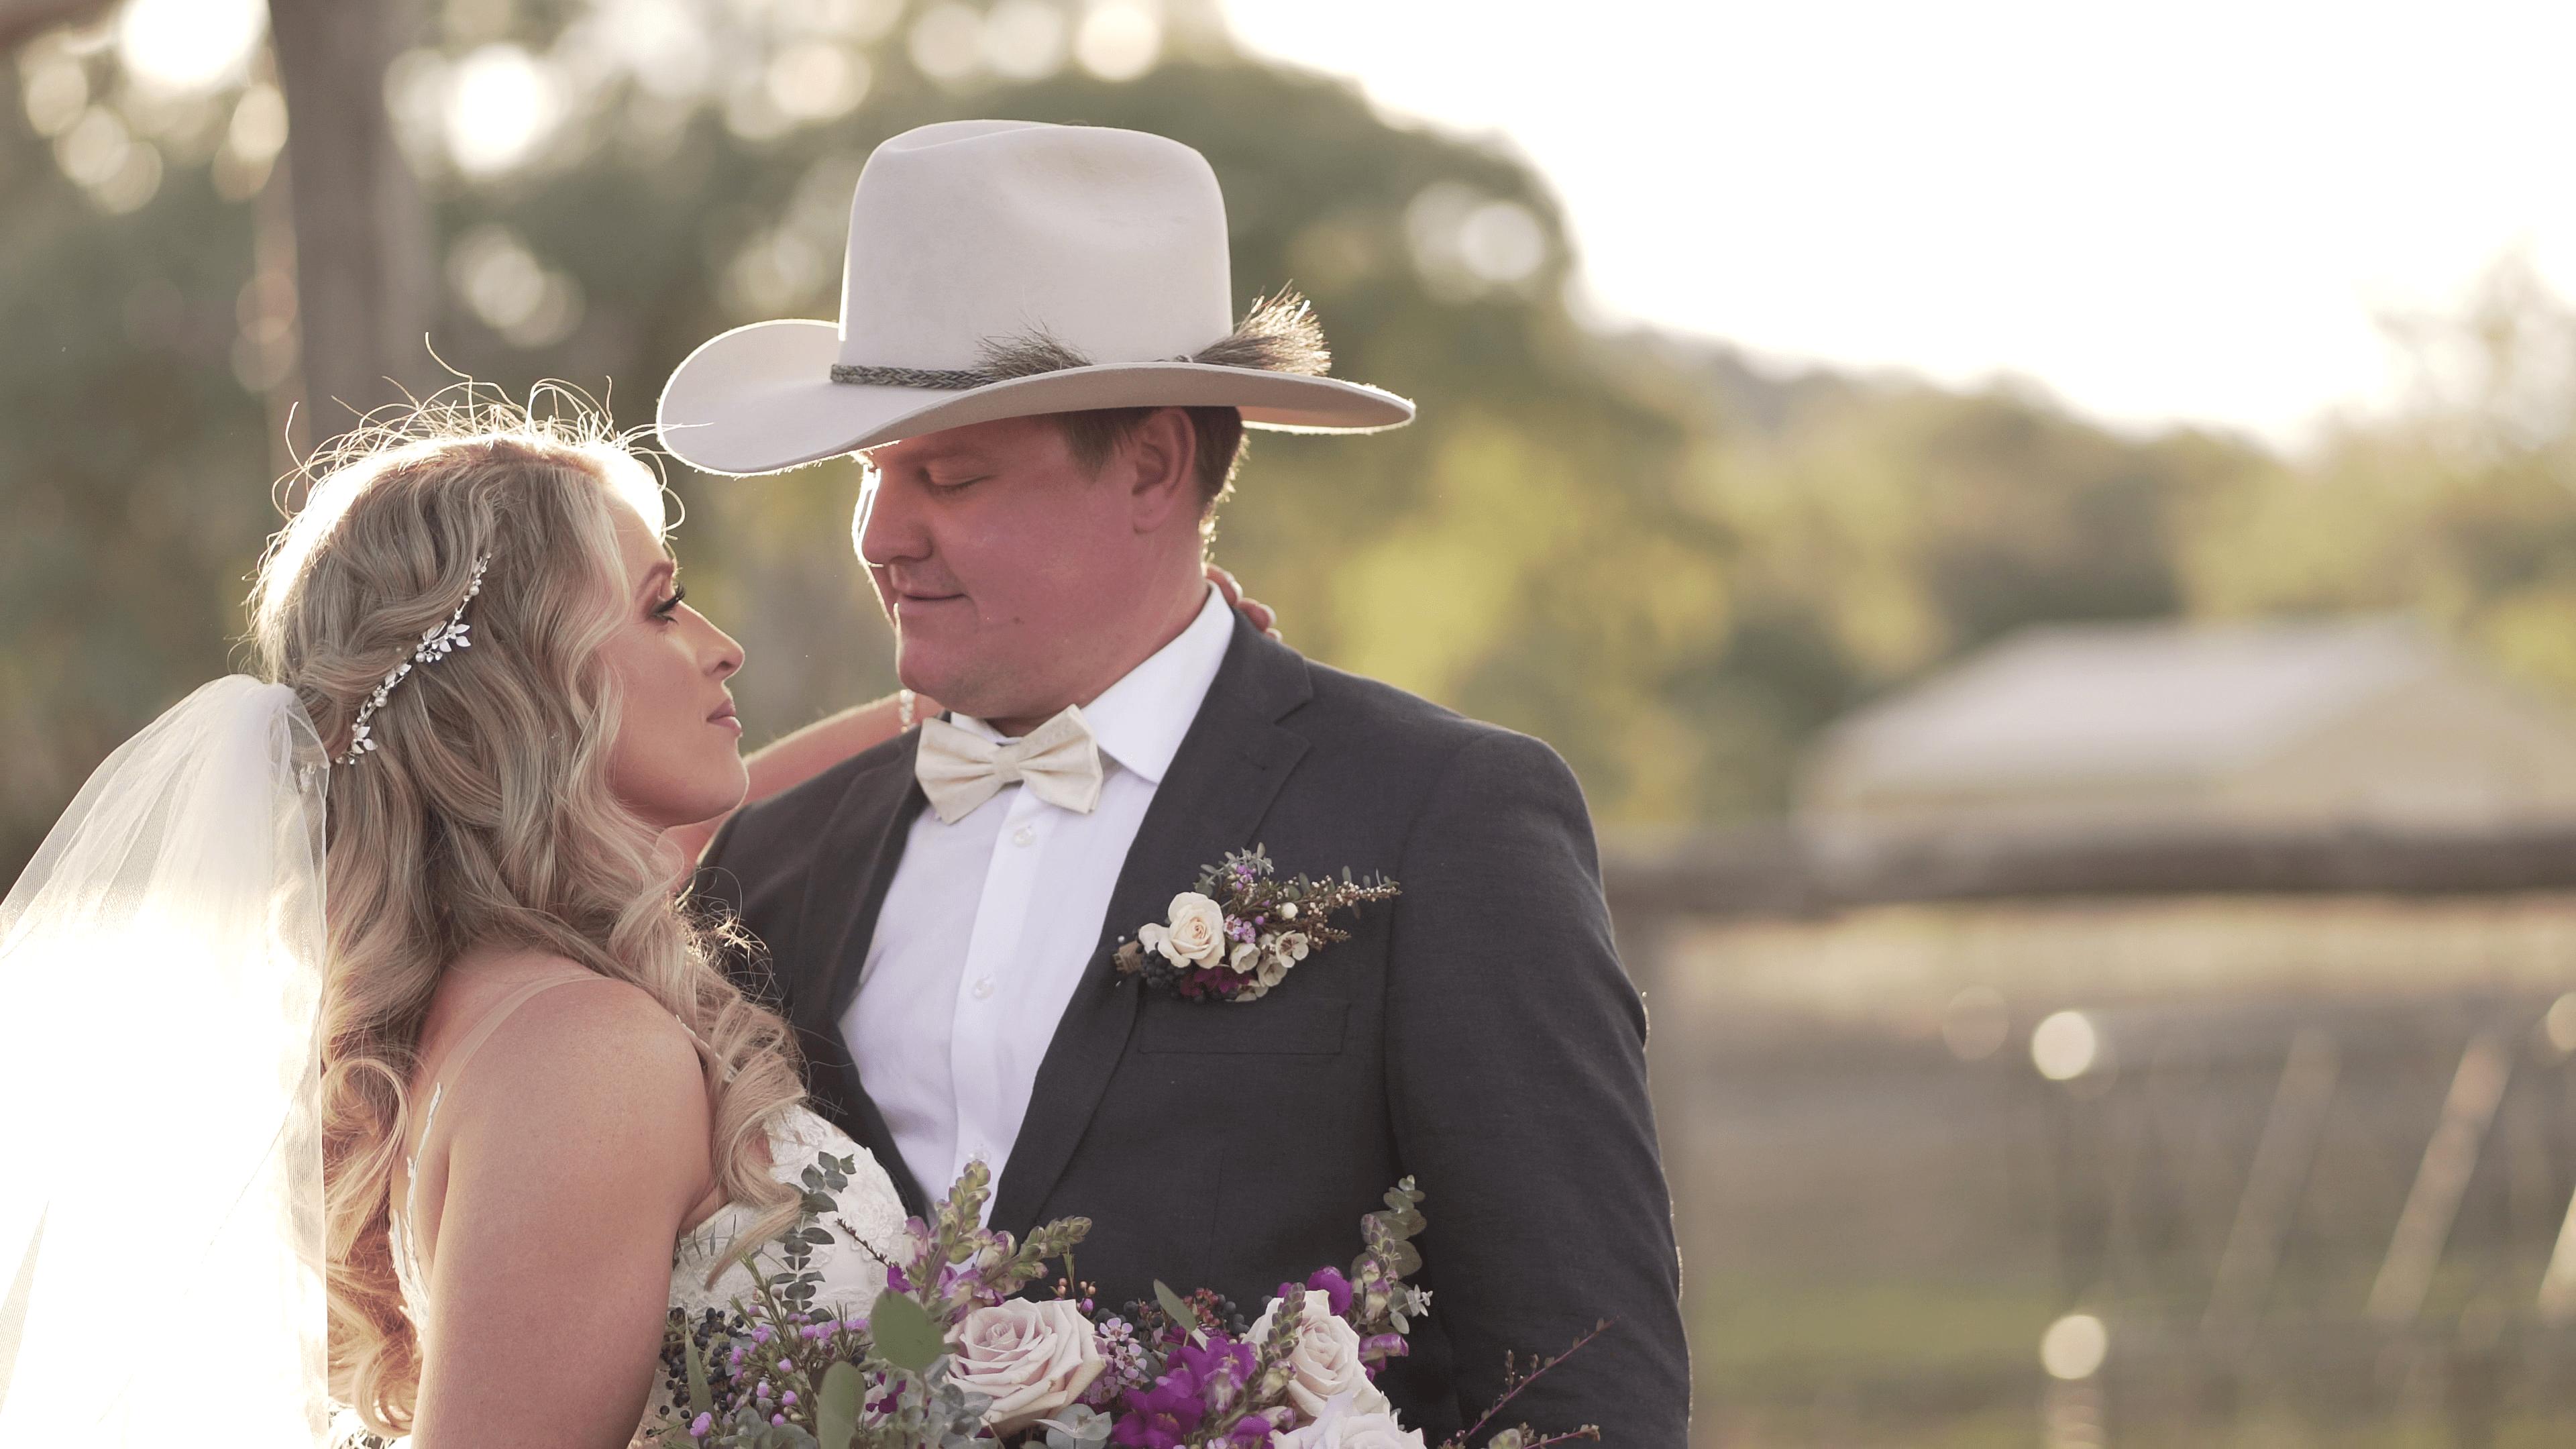 Adora Downs wedding photographer and videographer